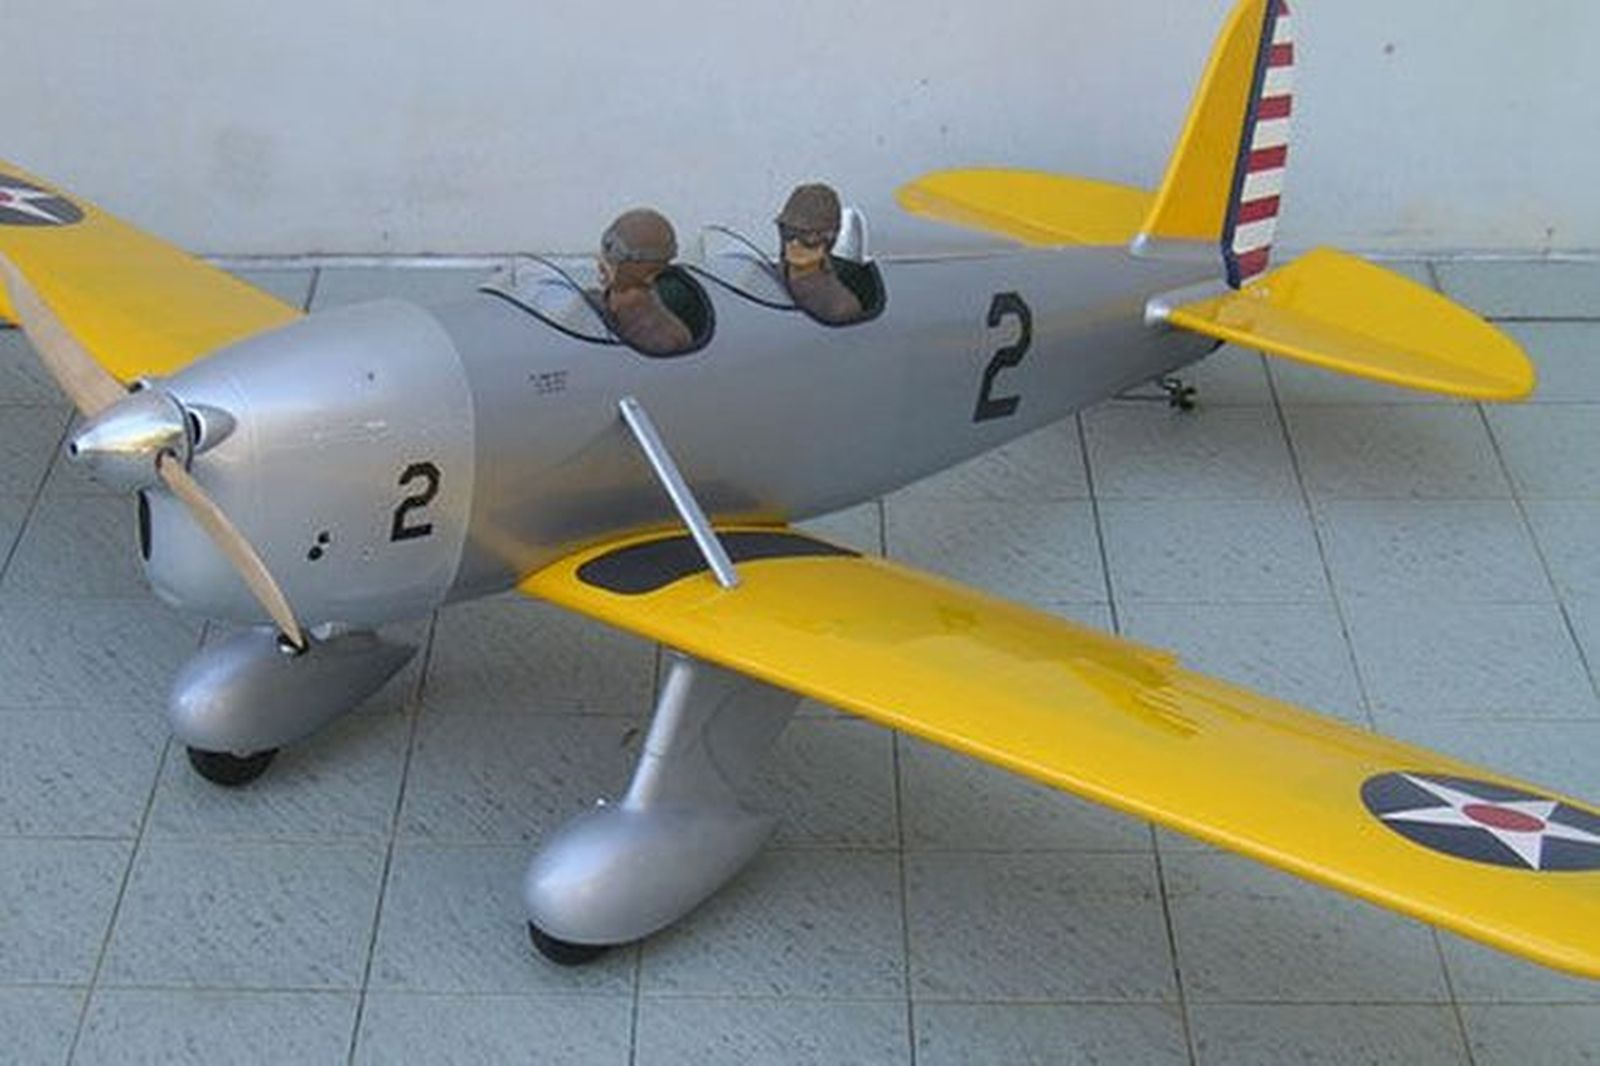 Model Plane - STA- Military RYAN flying model (2.1m. Wingspan)